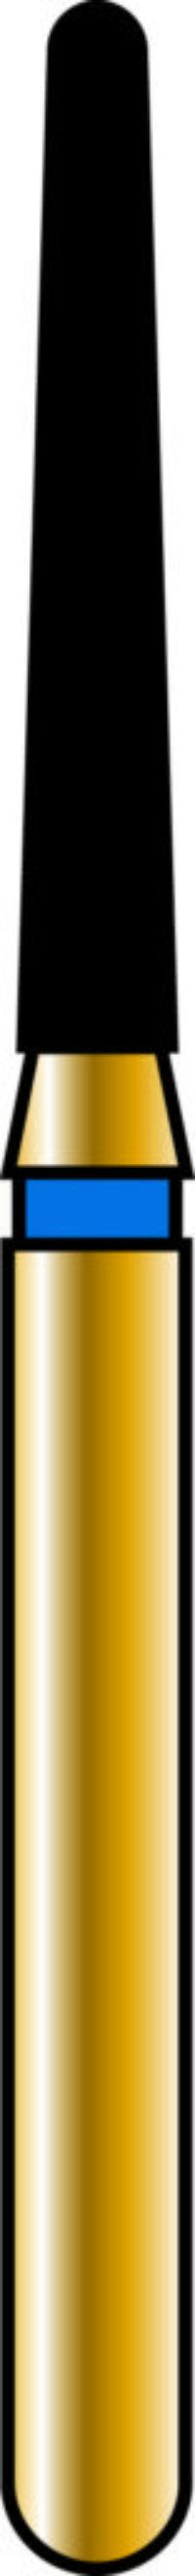 Round End Taper 14-9mm Gold Diamond Bur